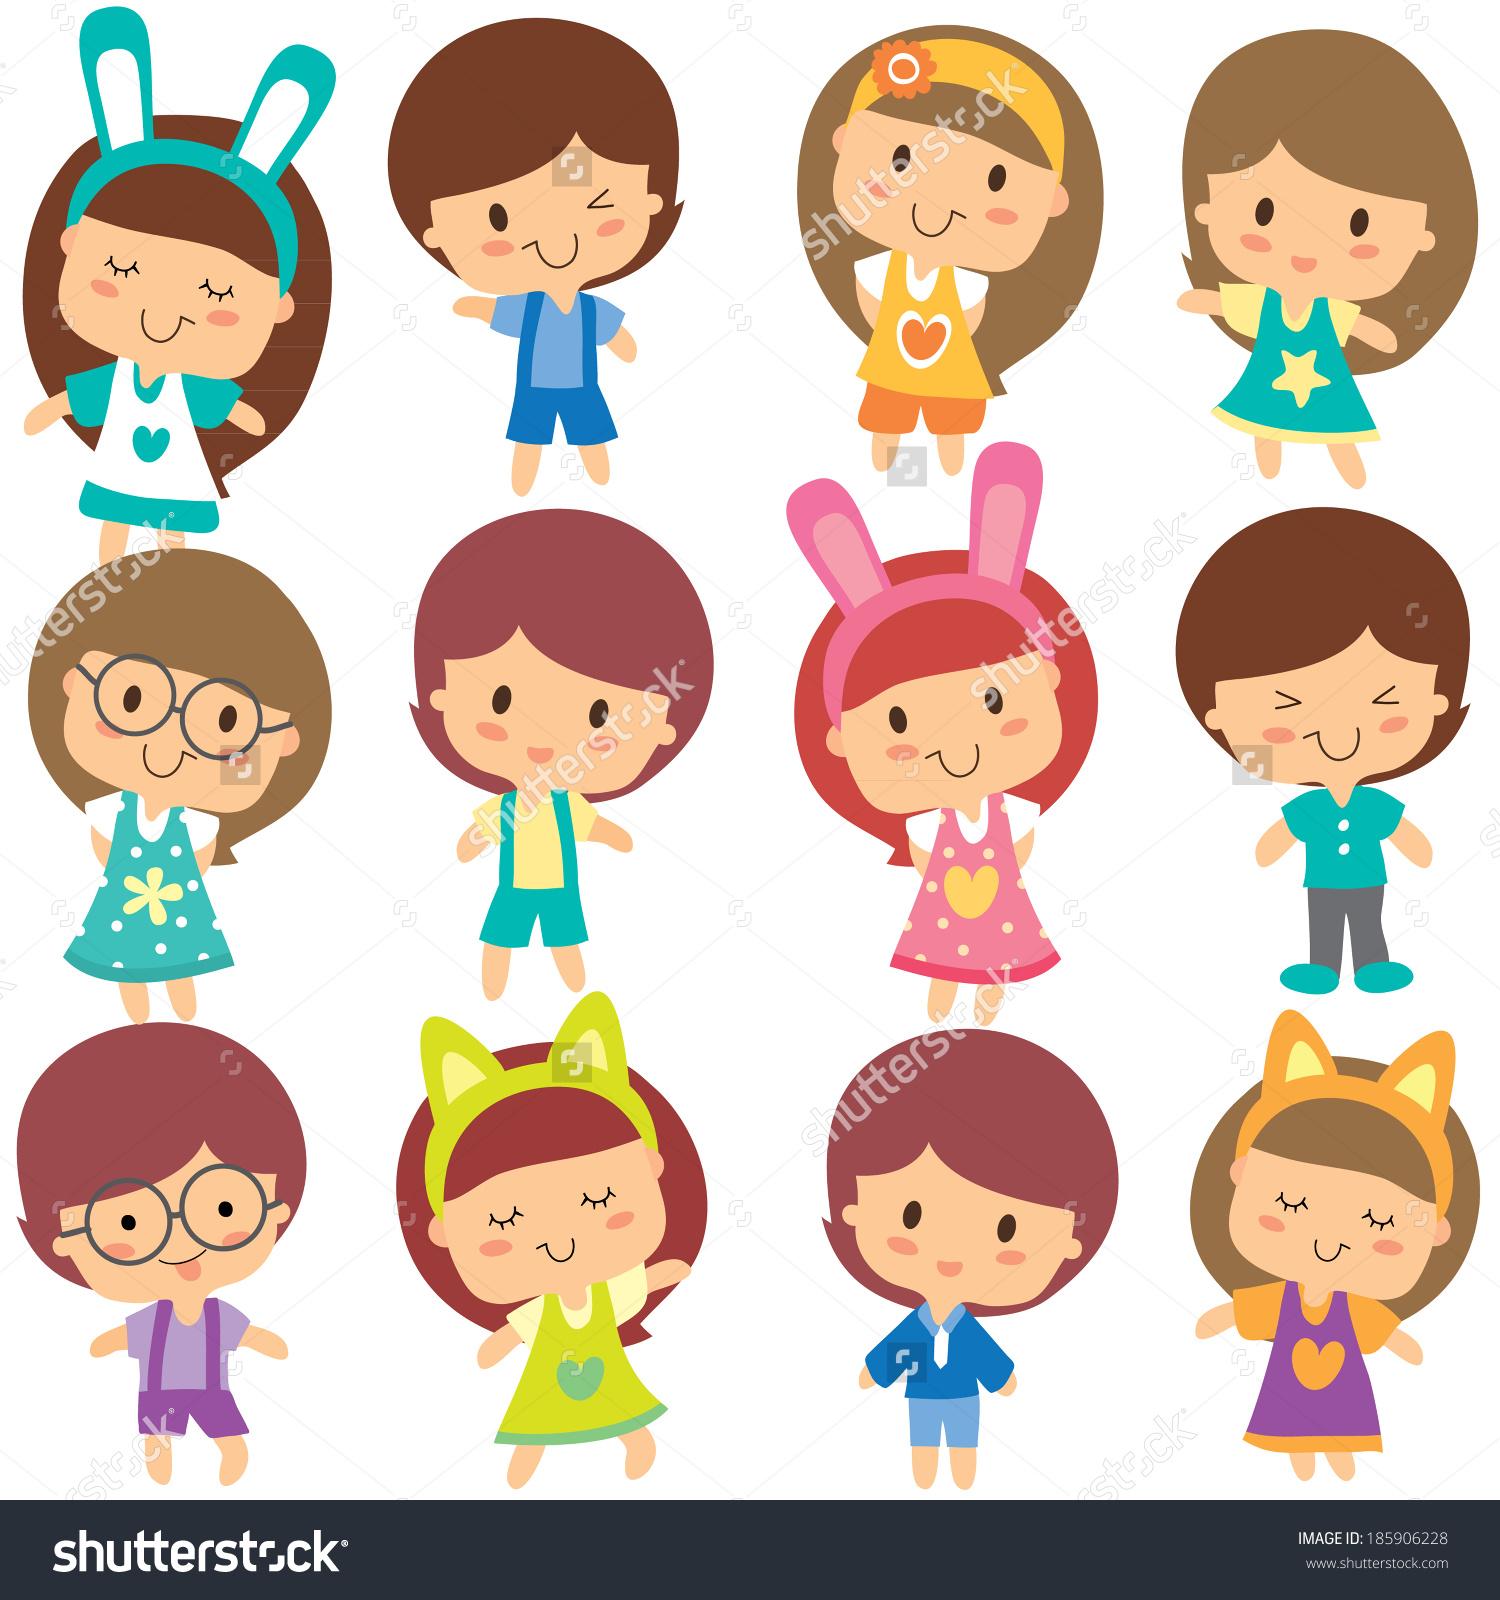 happy children clip art set - Happy Children Clipart